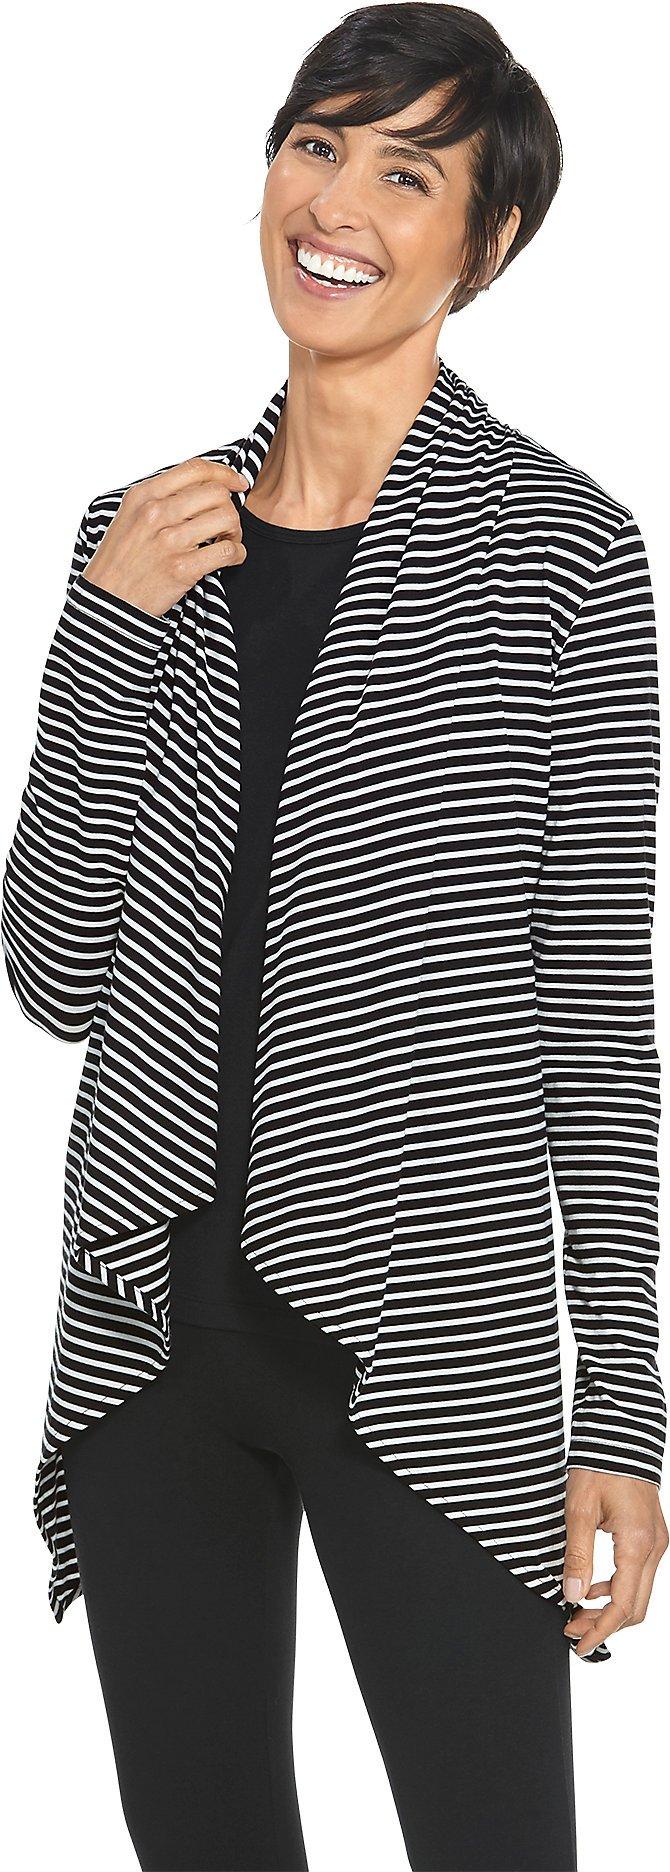 Coolibar UPF 50+ Women's Sun Wrap - Sun Protective (Medium- Fine Black/White Stripe)